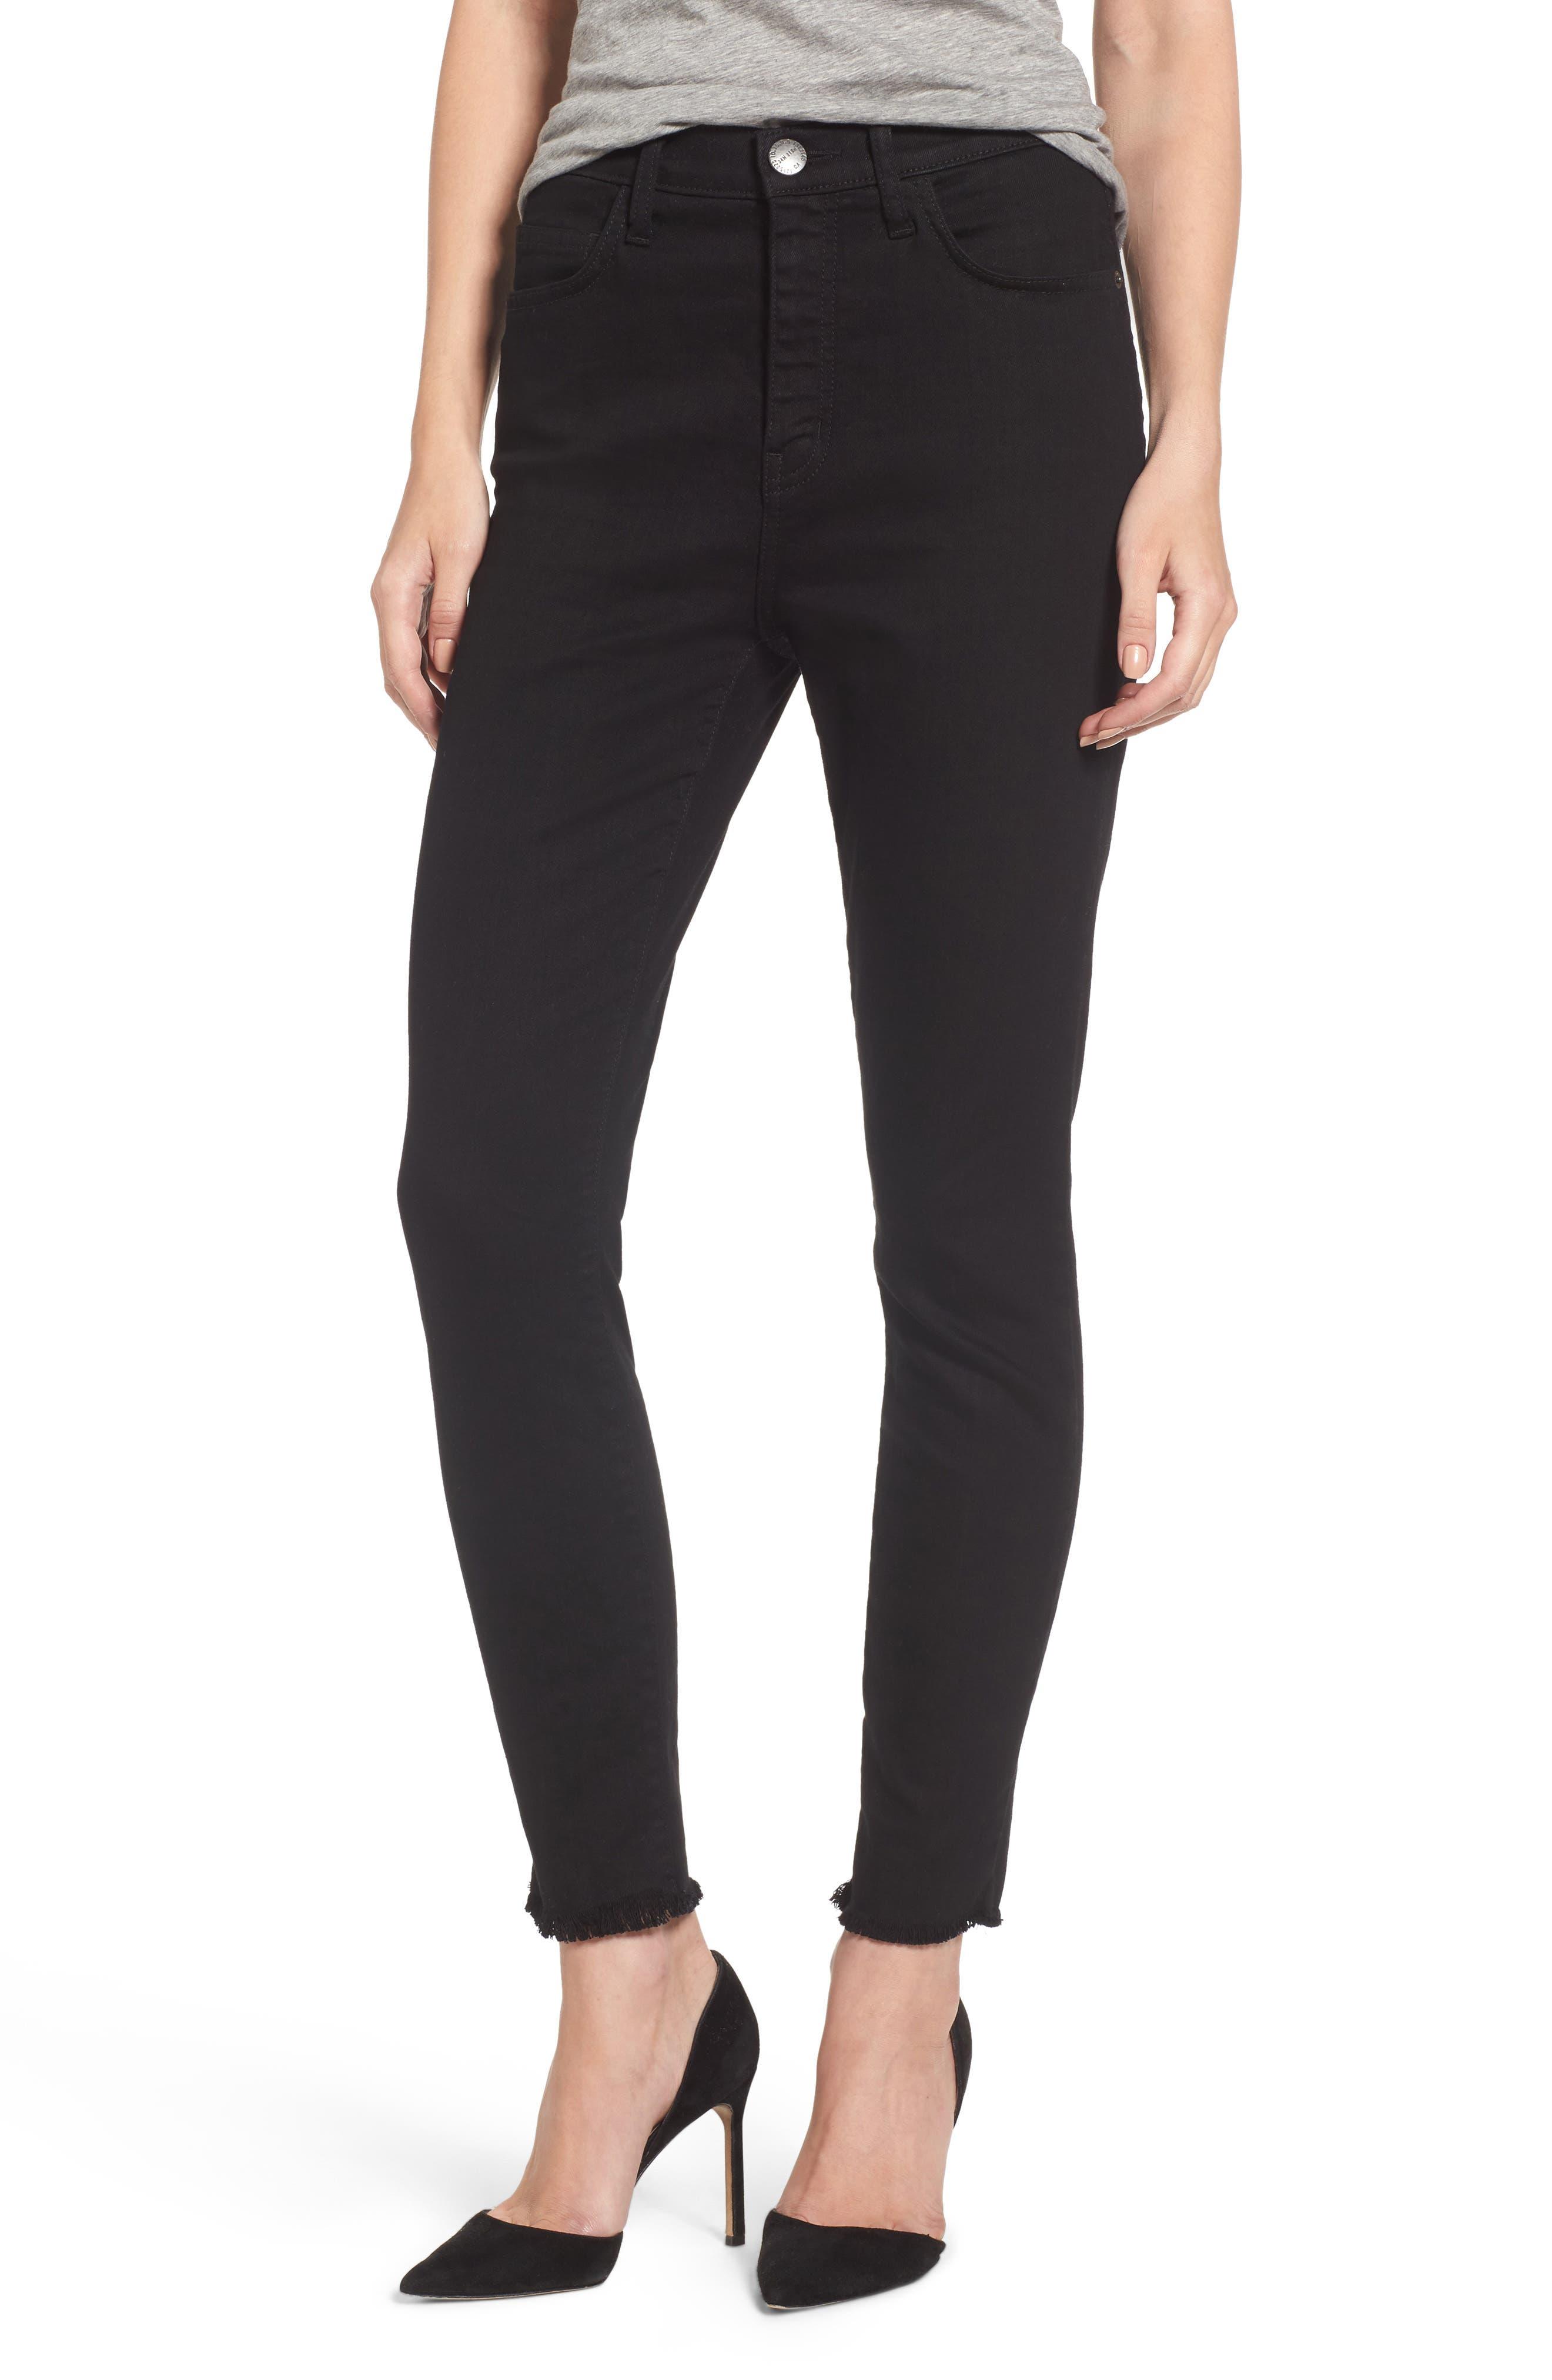 The Super High Waist Stiletto Ankle Skinny Jeans,                             Main thumbnail 1, color,                             Jet Black